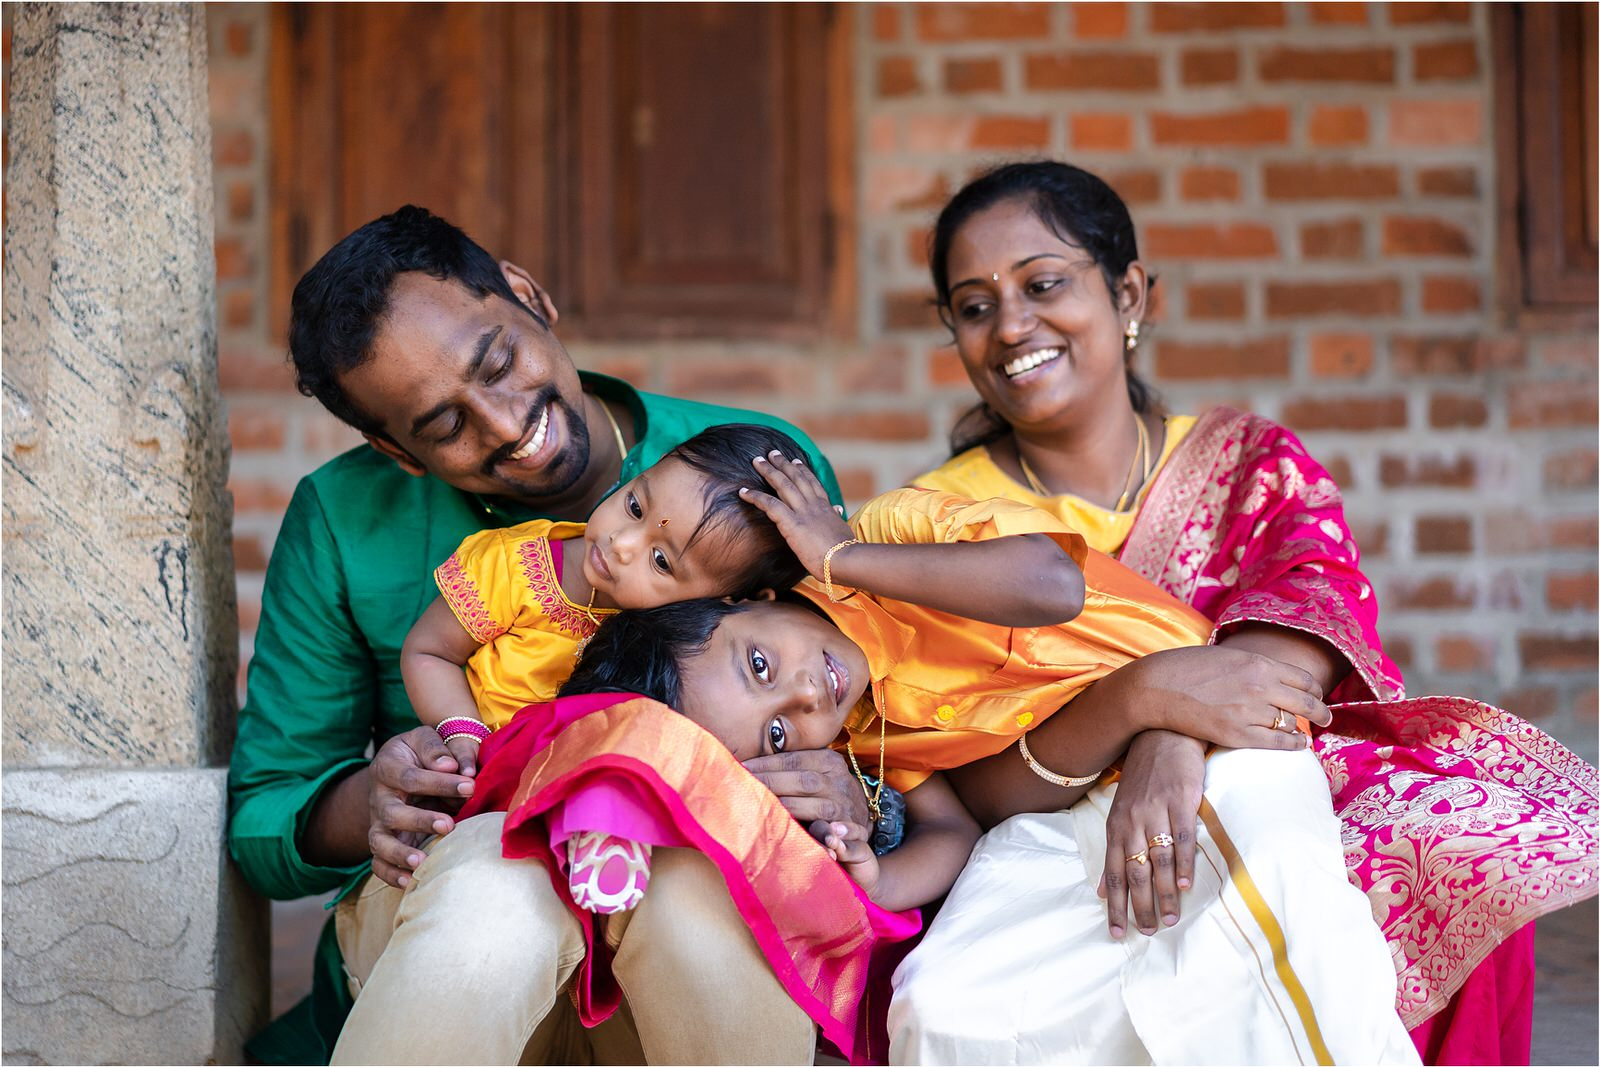 19012019-Nila-Pratyush-Family-Shoot-380.jpg